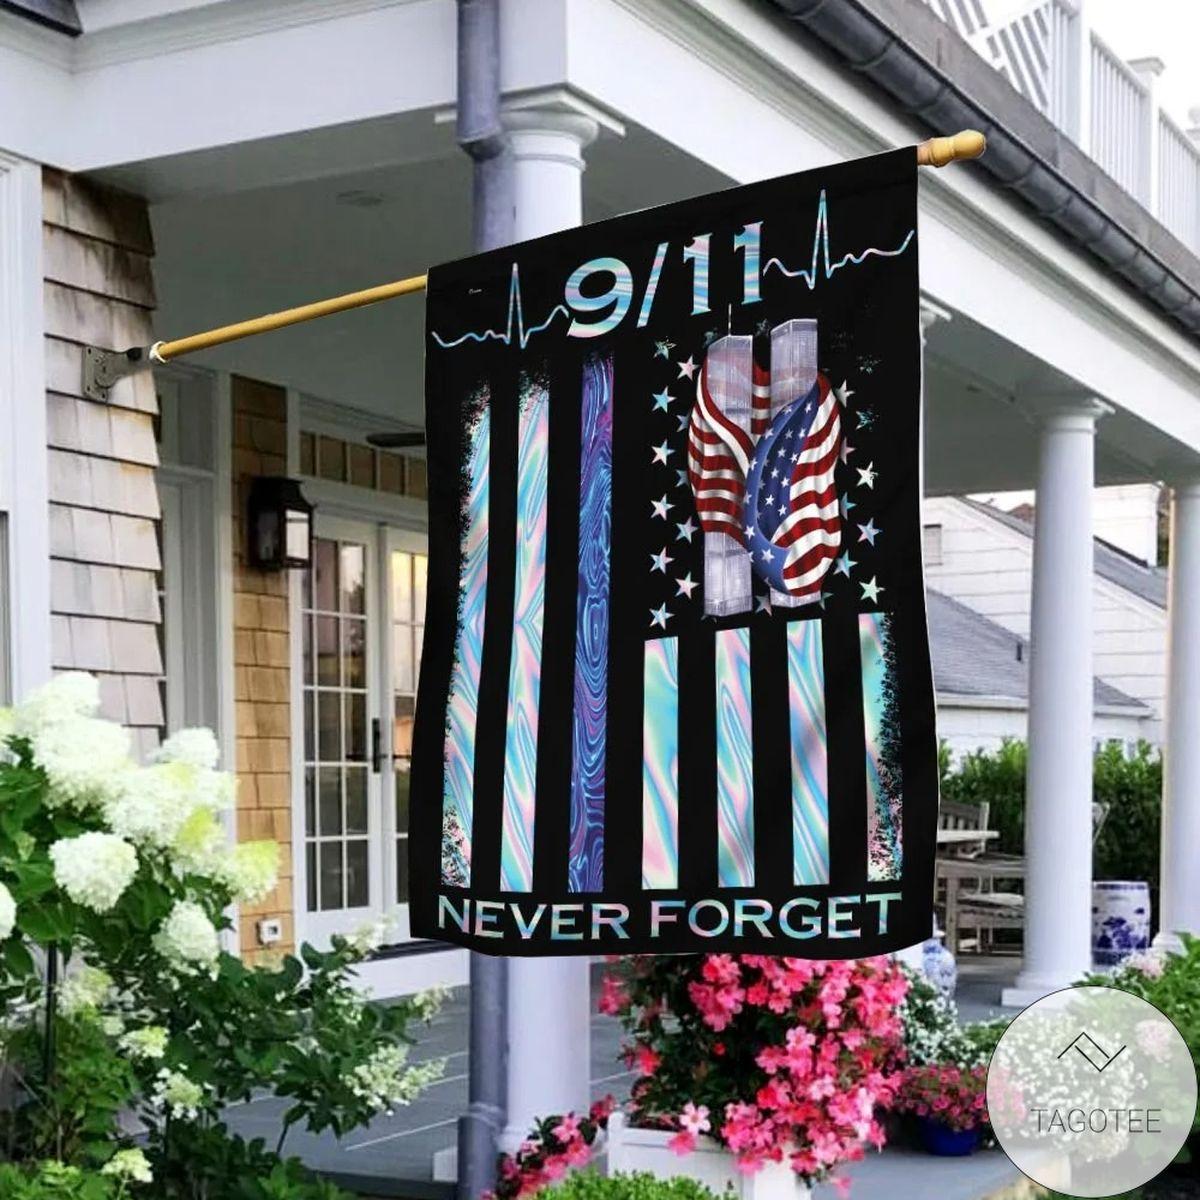 Patriot Day 911 Never Forget Hologram House Flag